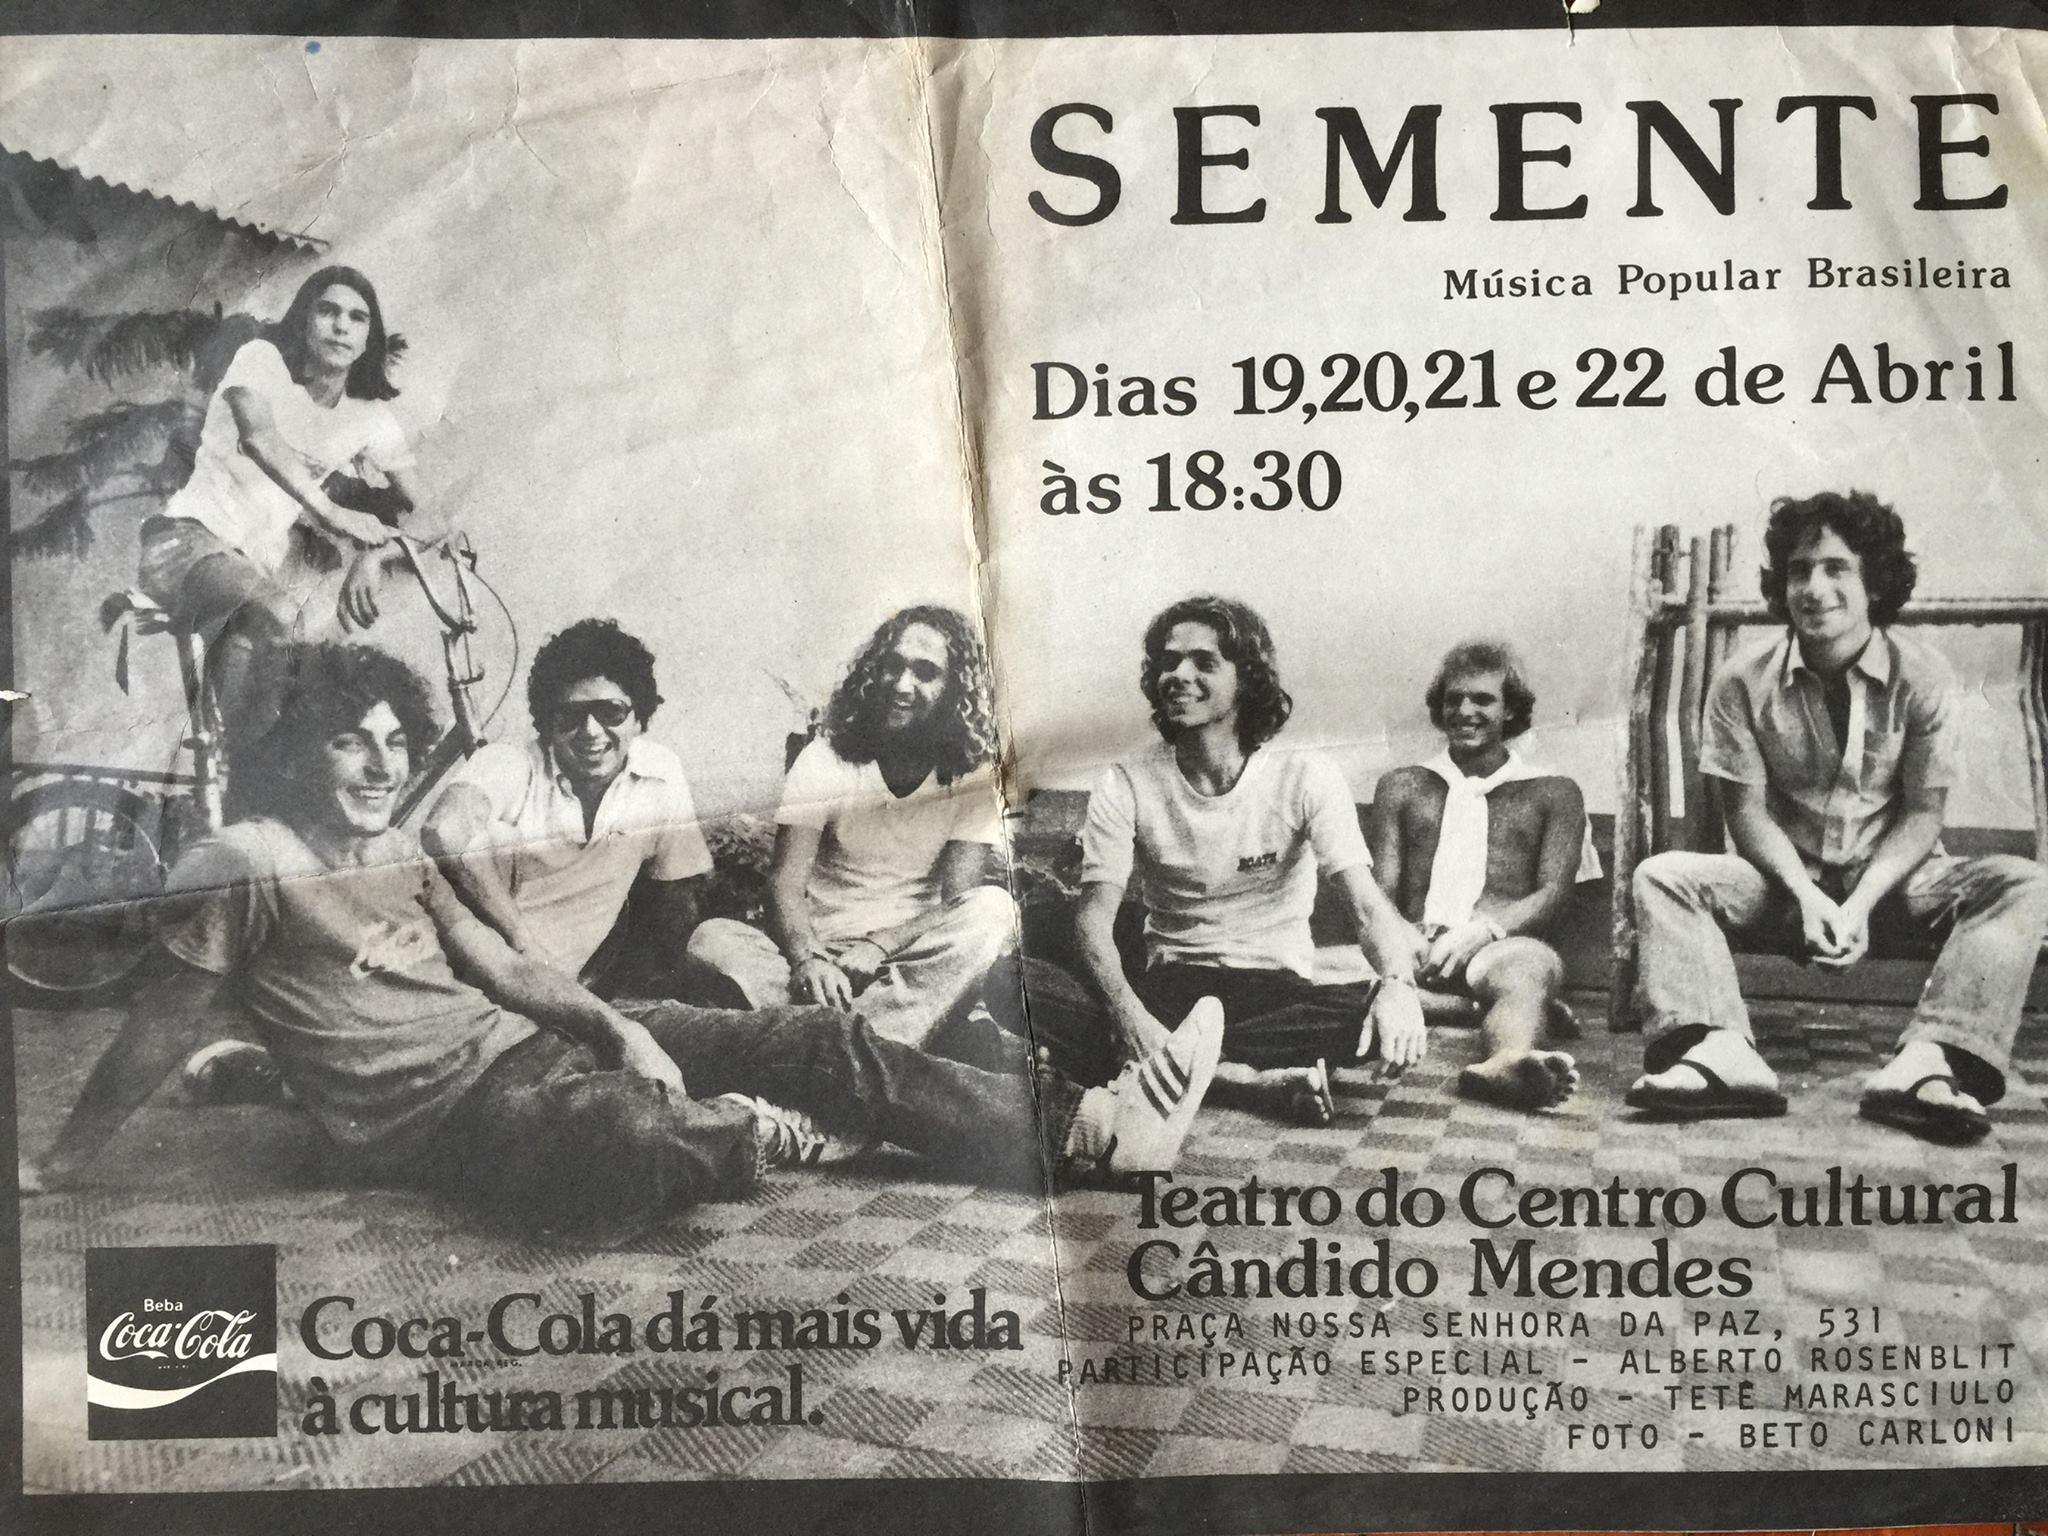 Semente Group